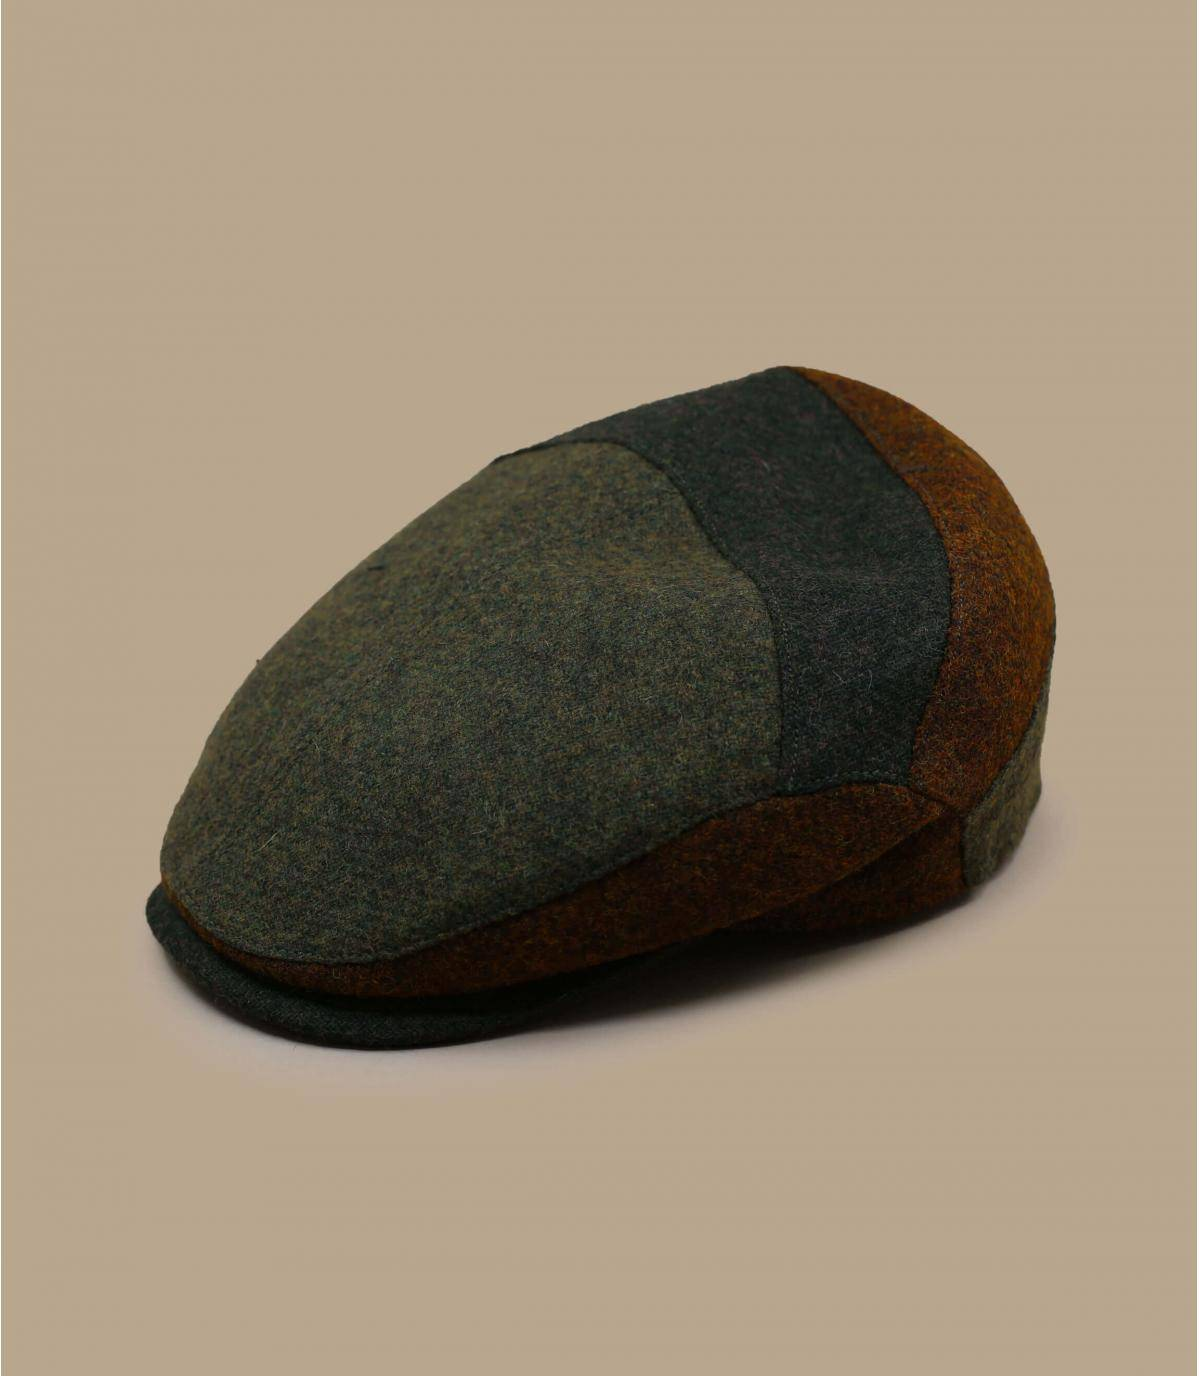 Dettagli Prince Wool Multi - image 2